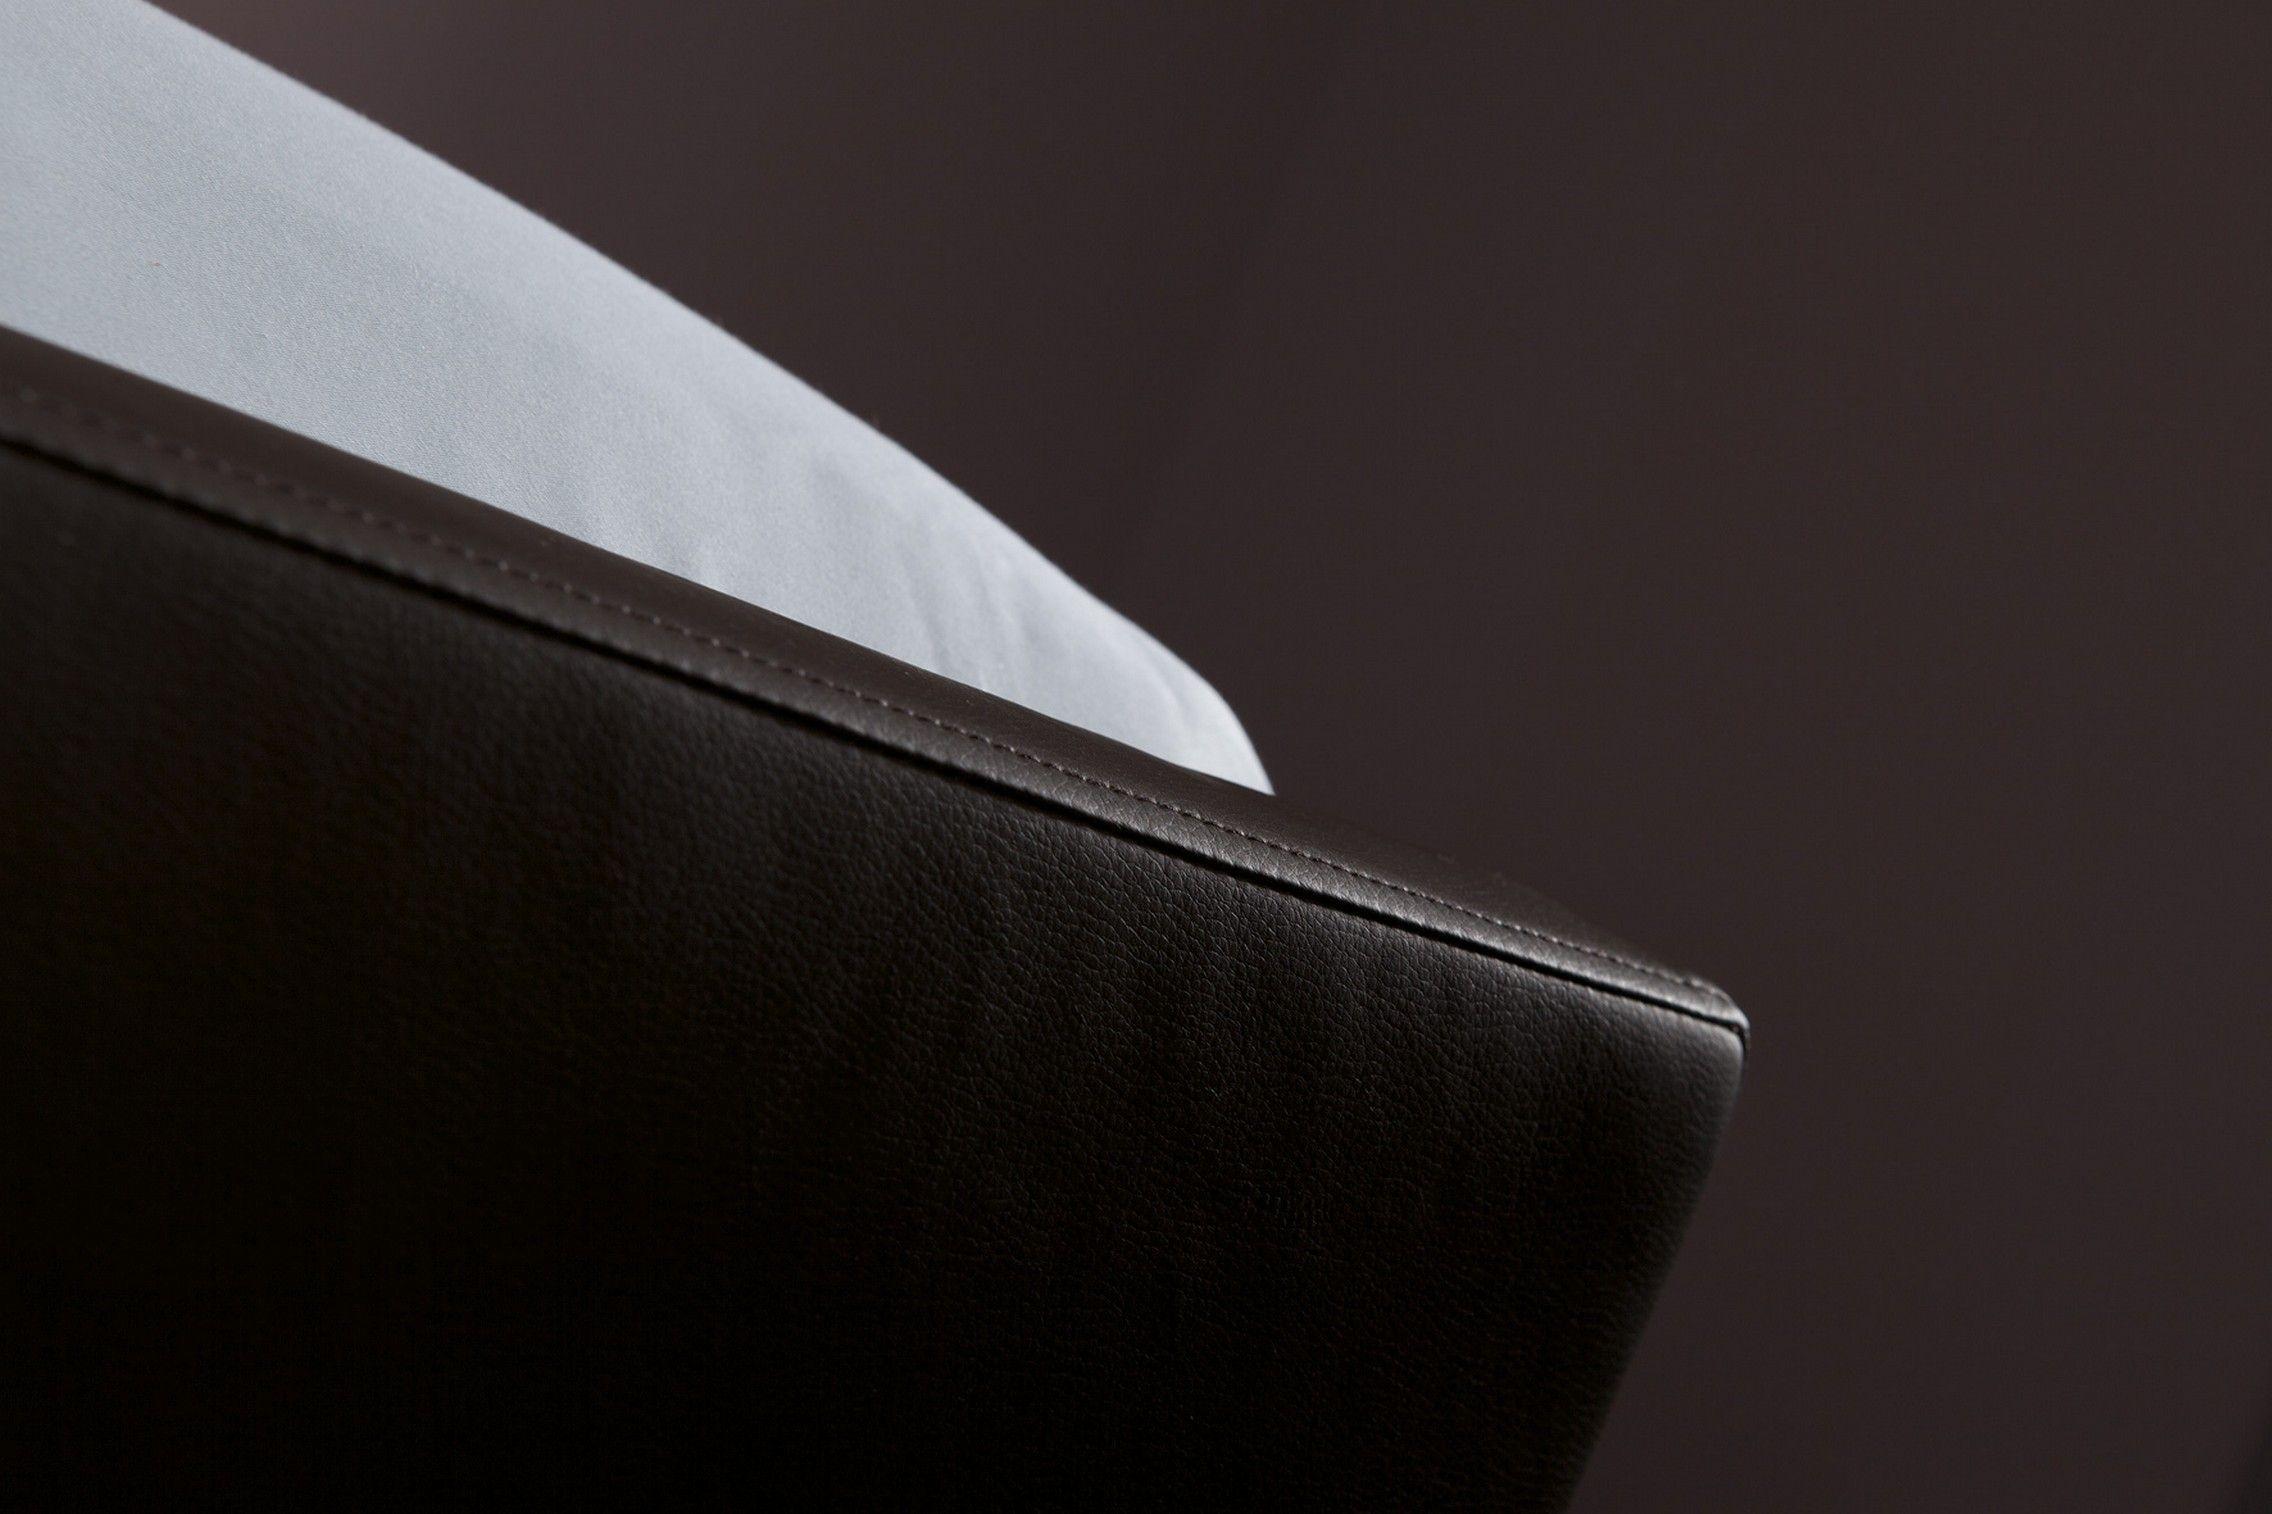 Hml bedding boxspring Forte met hoofdbord Lento en voetbord Staccato in kleur Crush 123 espresso / bruin leder look.